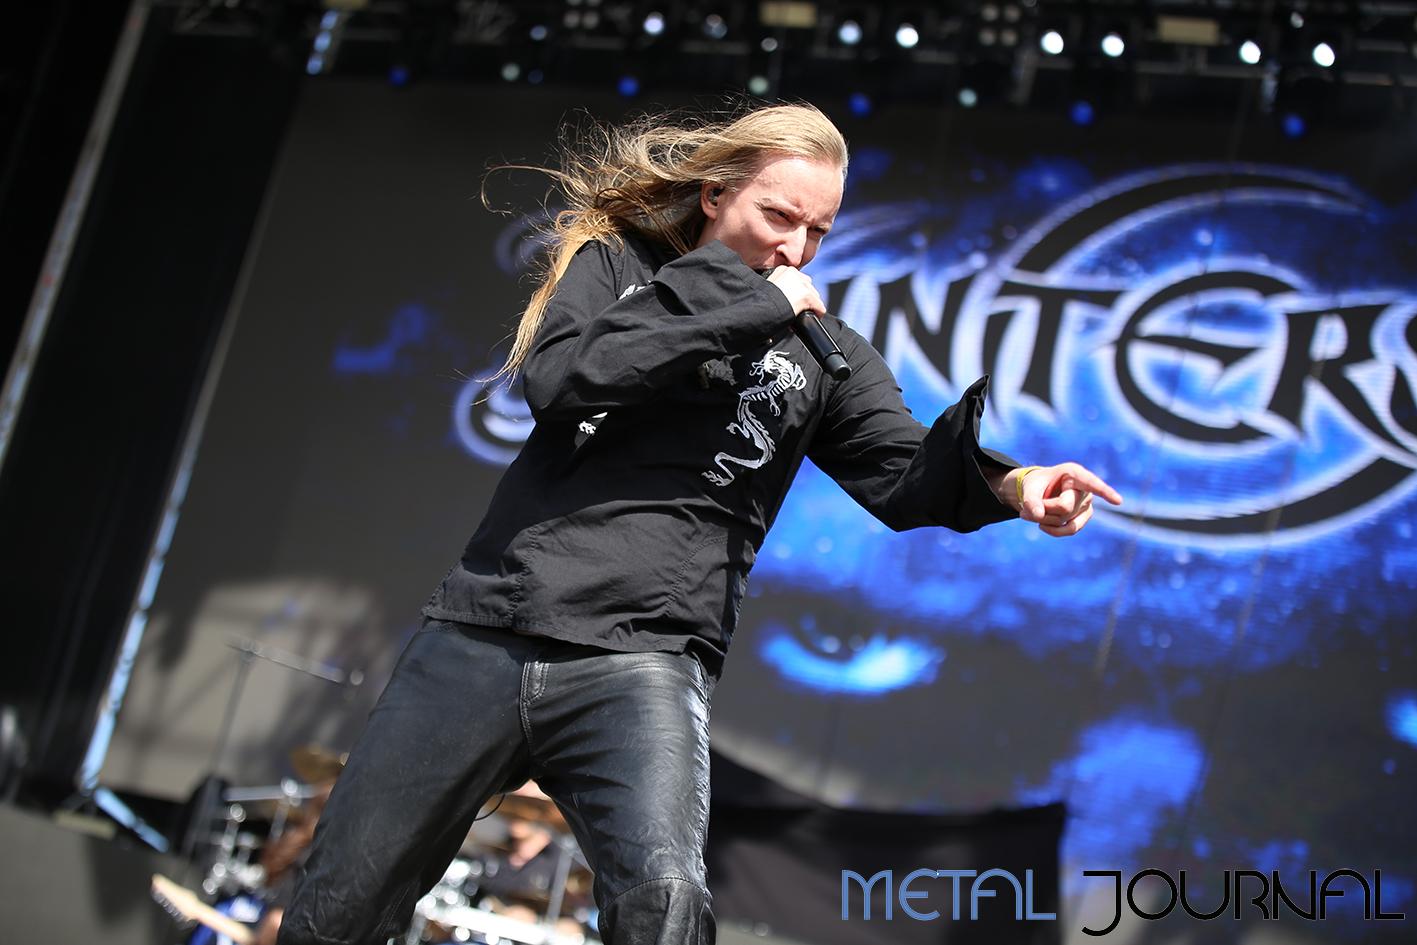 wintersun metal journal rock the coast 2019 pic 4